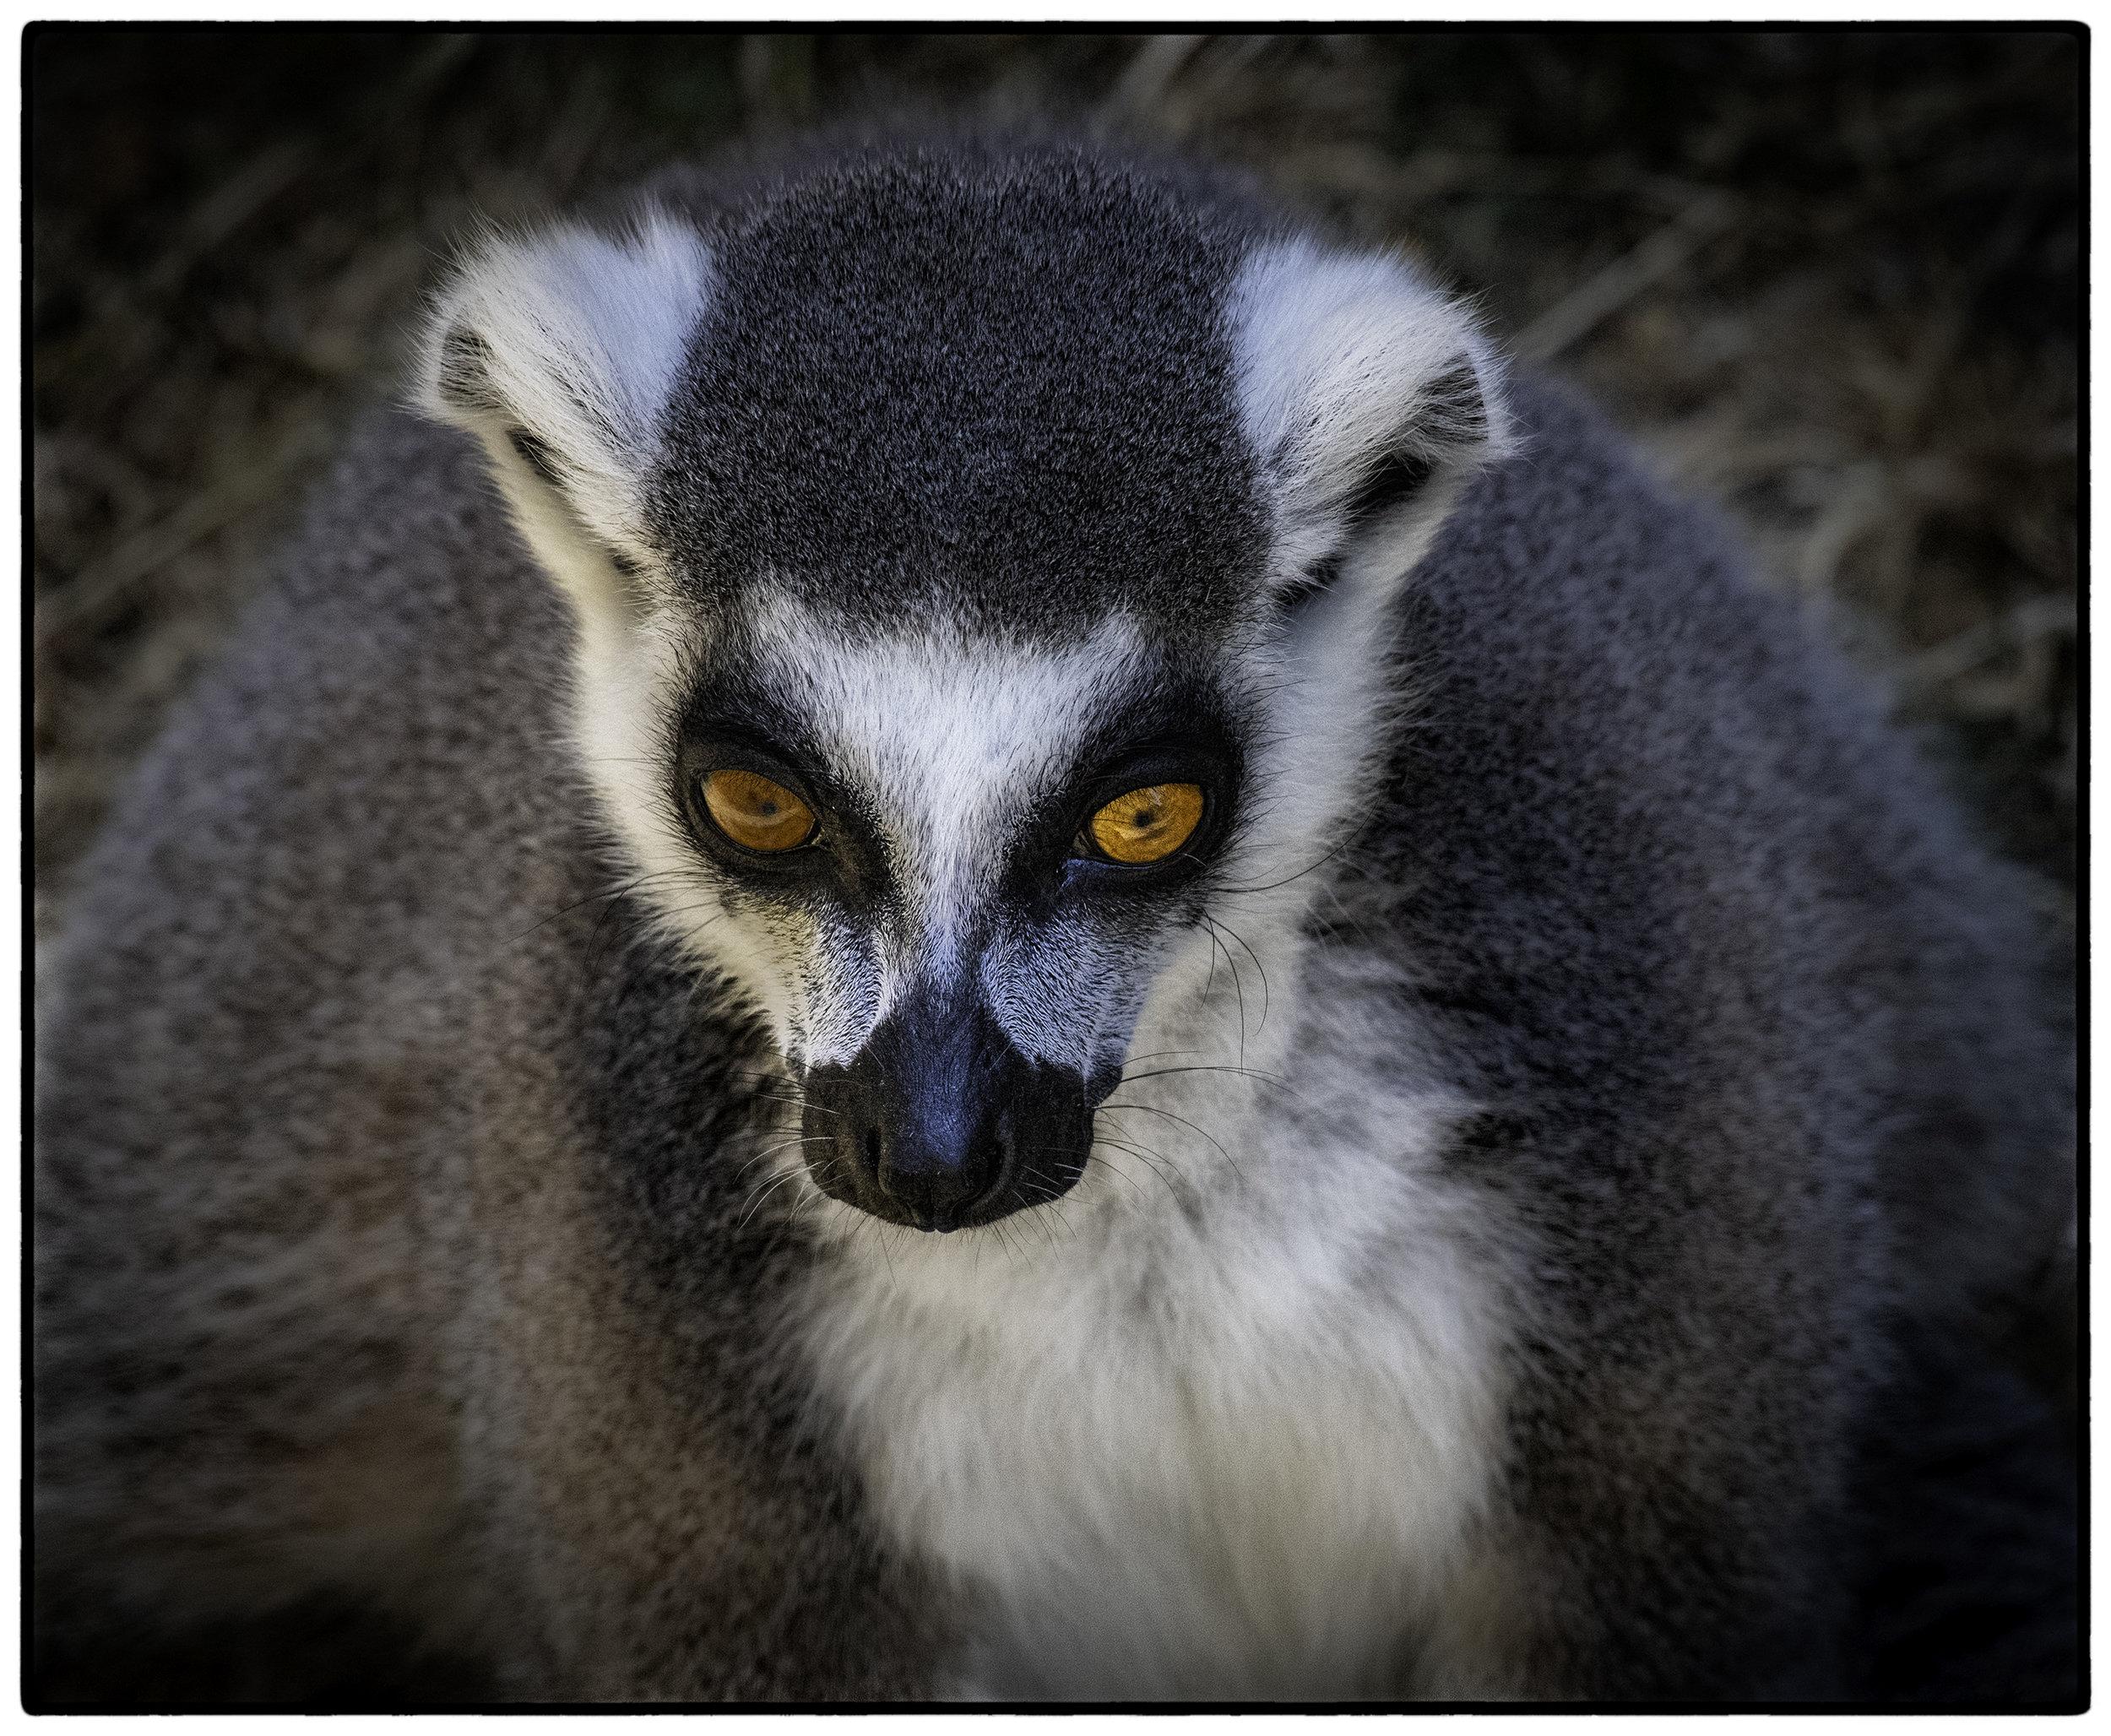 Lemur, Oakland